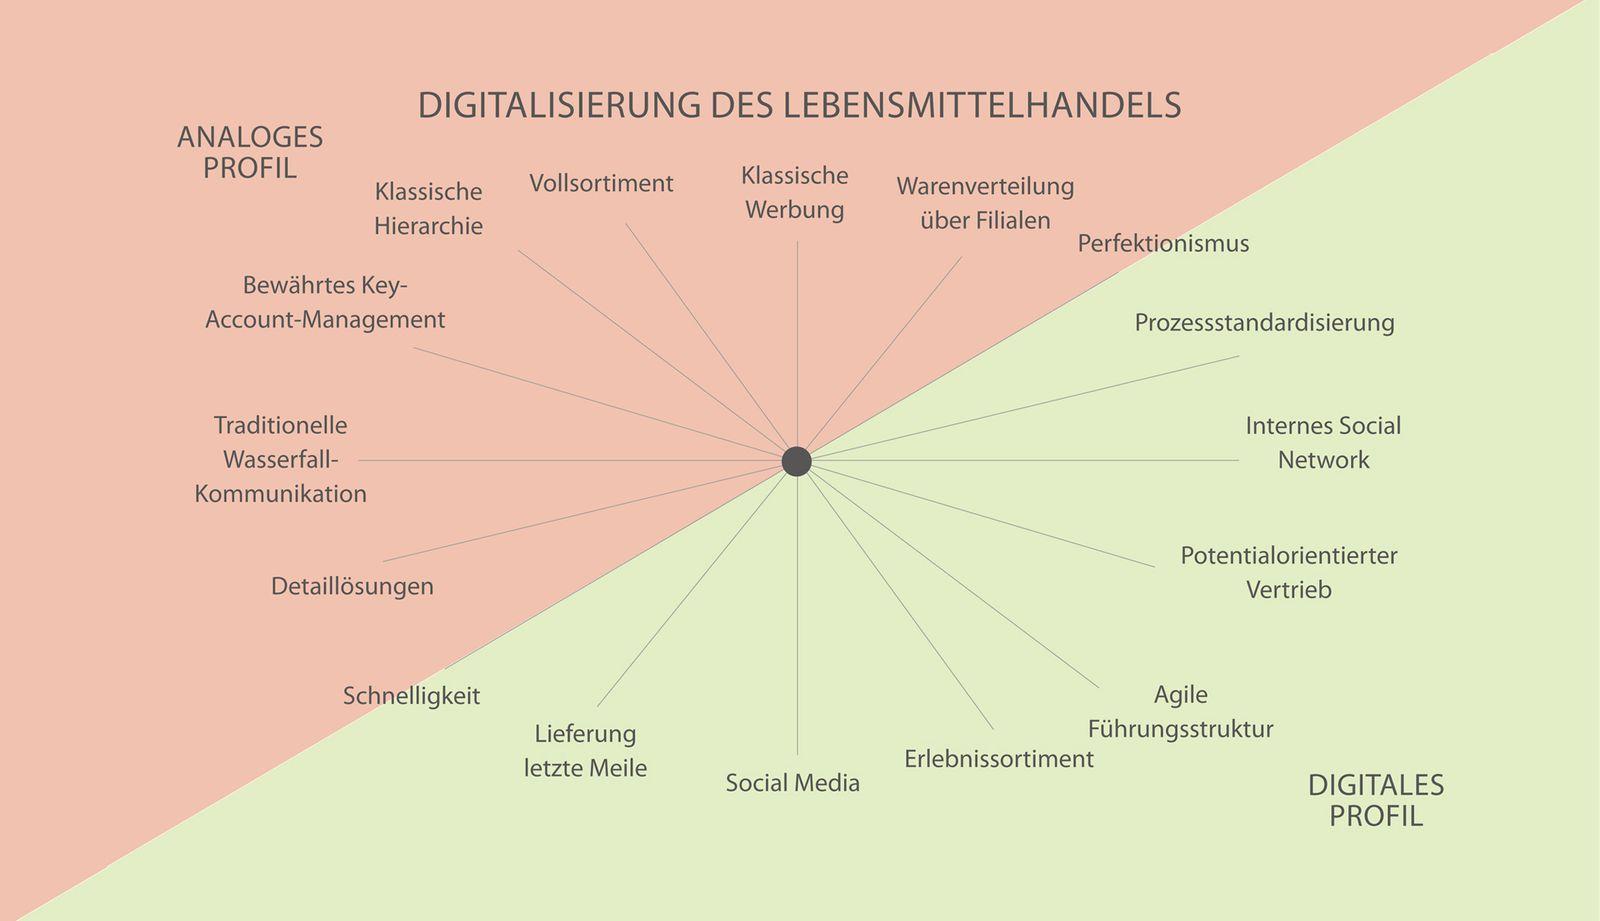 HAFNER & CIE Praesentation - Digitalisierung des Lebensmittelhandels V2